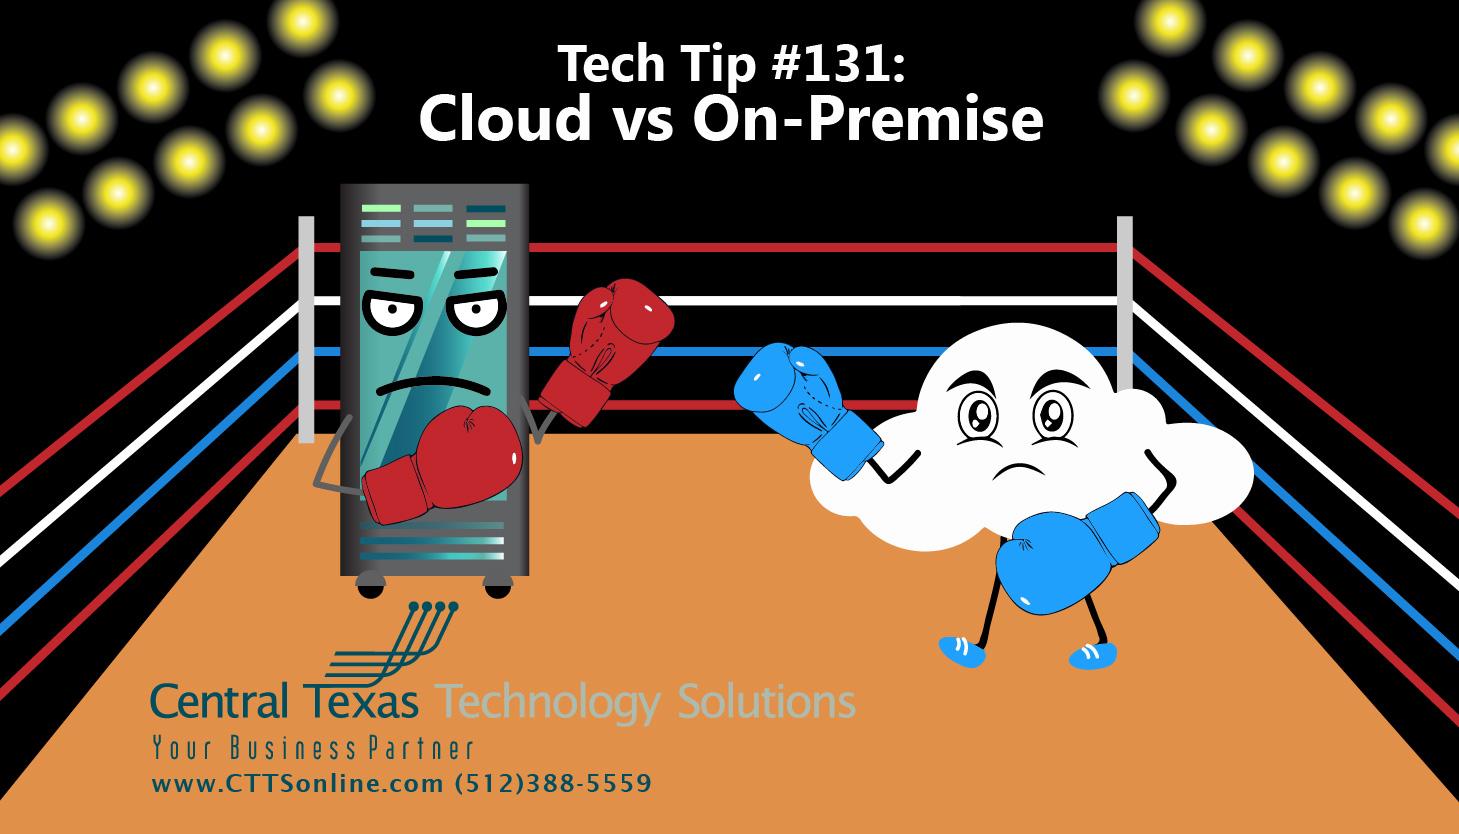 cloud vs data server Georgetown TX